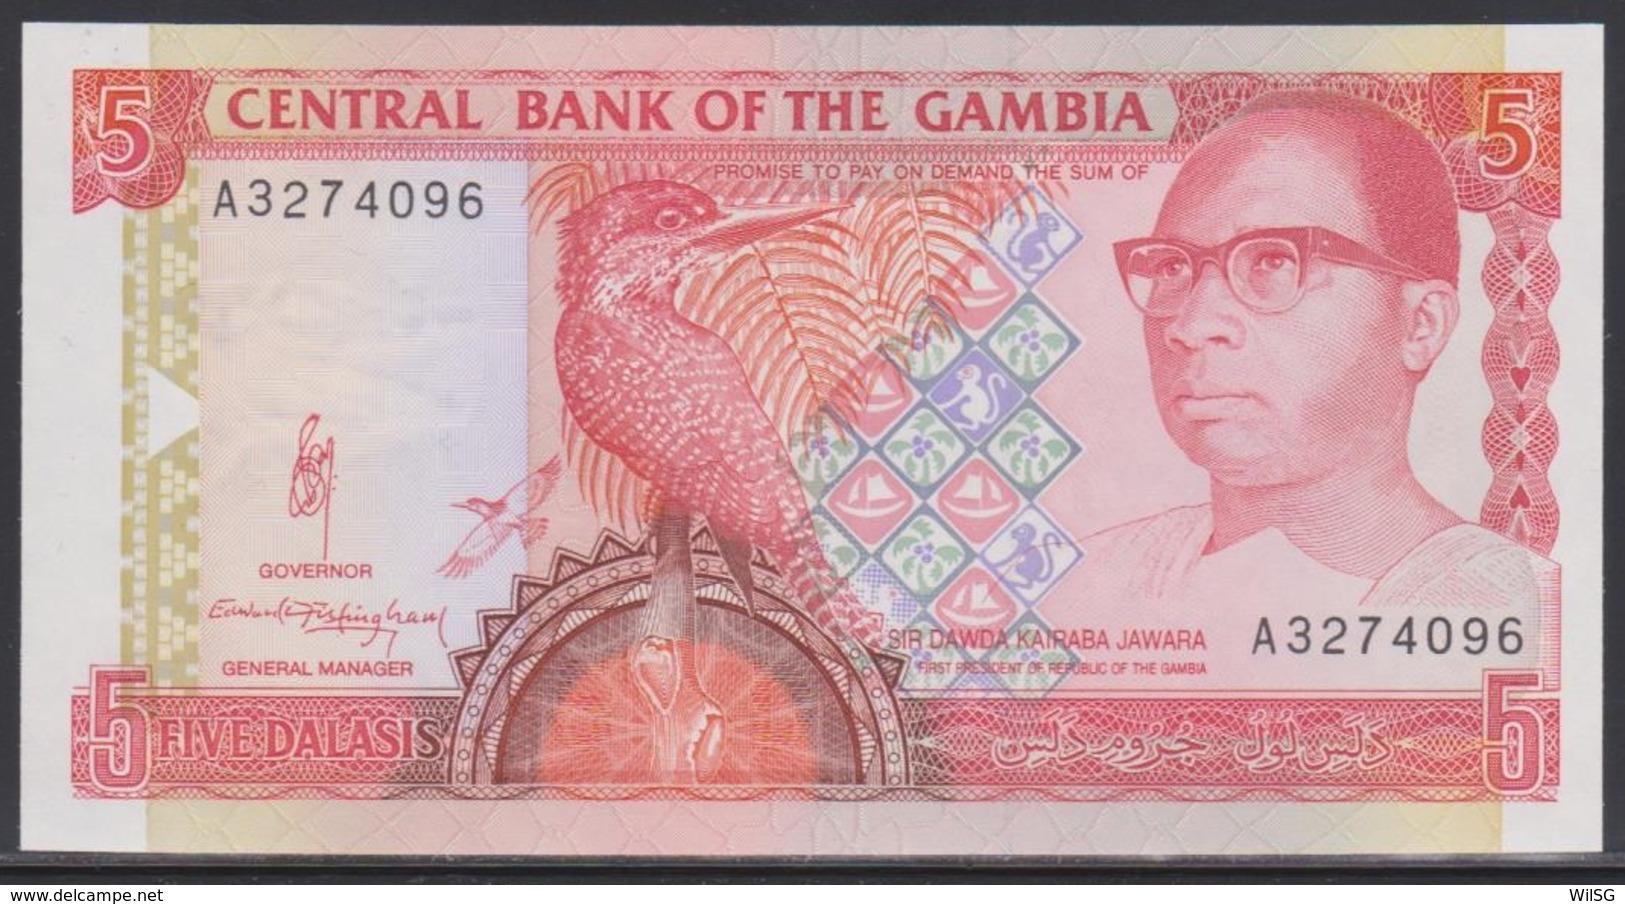 Gambia 5 Dalasis (ND 1991-1995) UNC - Gambia